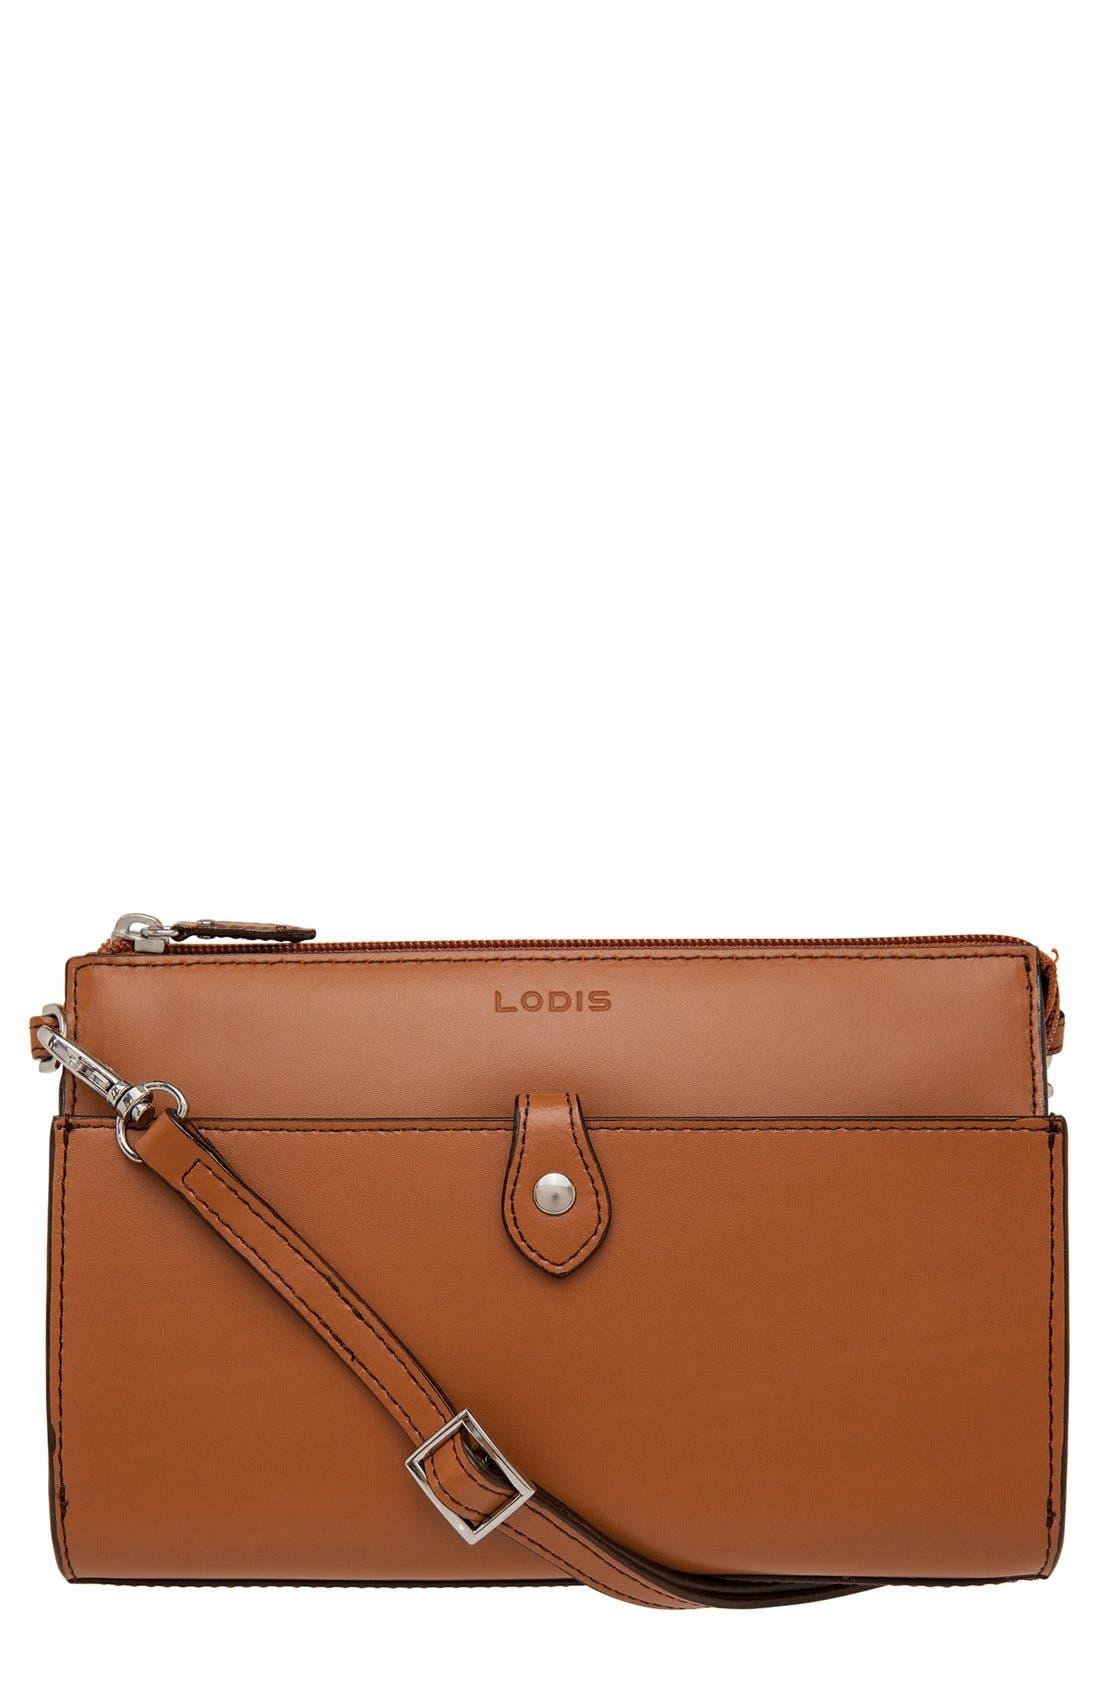 Lodis'Audrey Collection -Vicky' ConvertibleCrossbody Bag